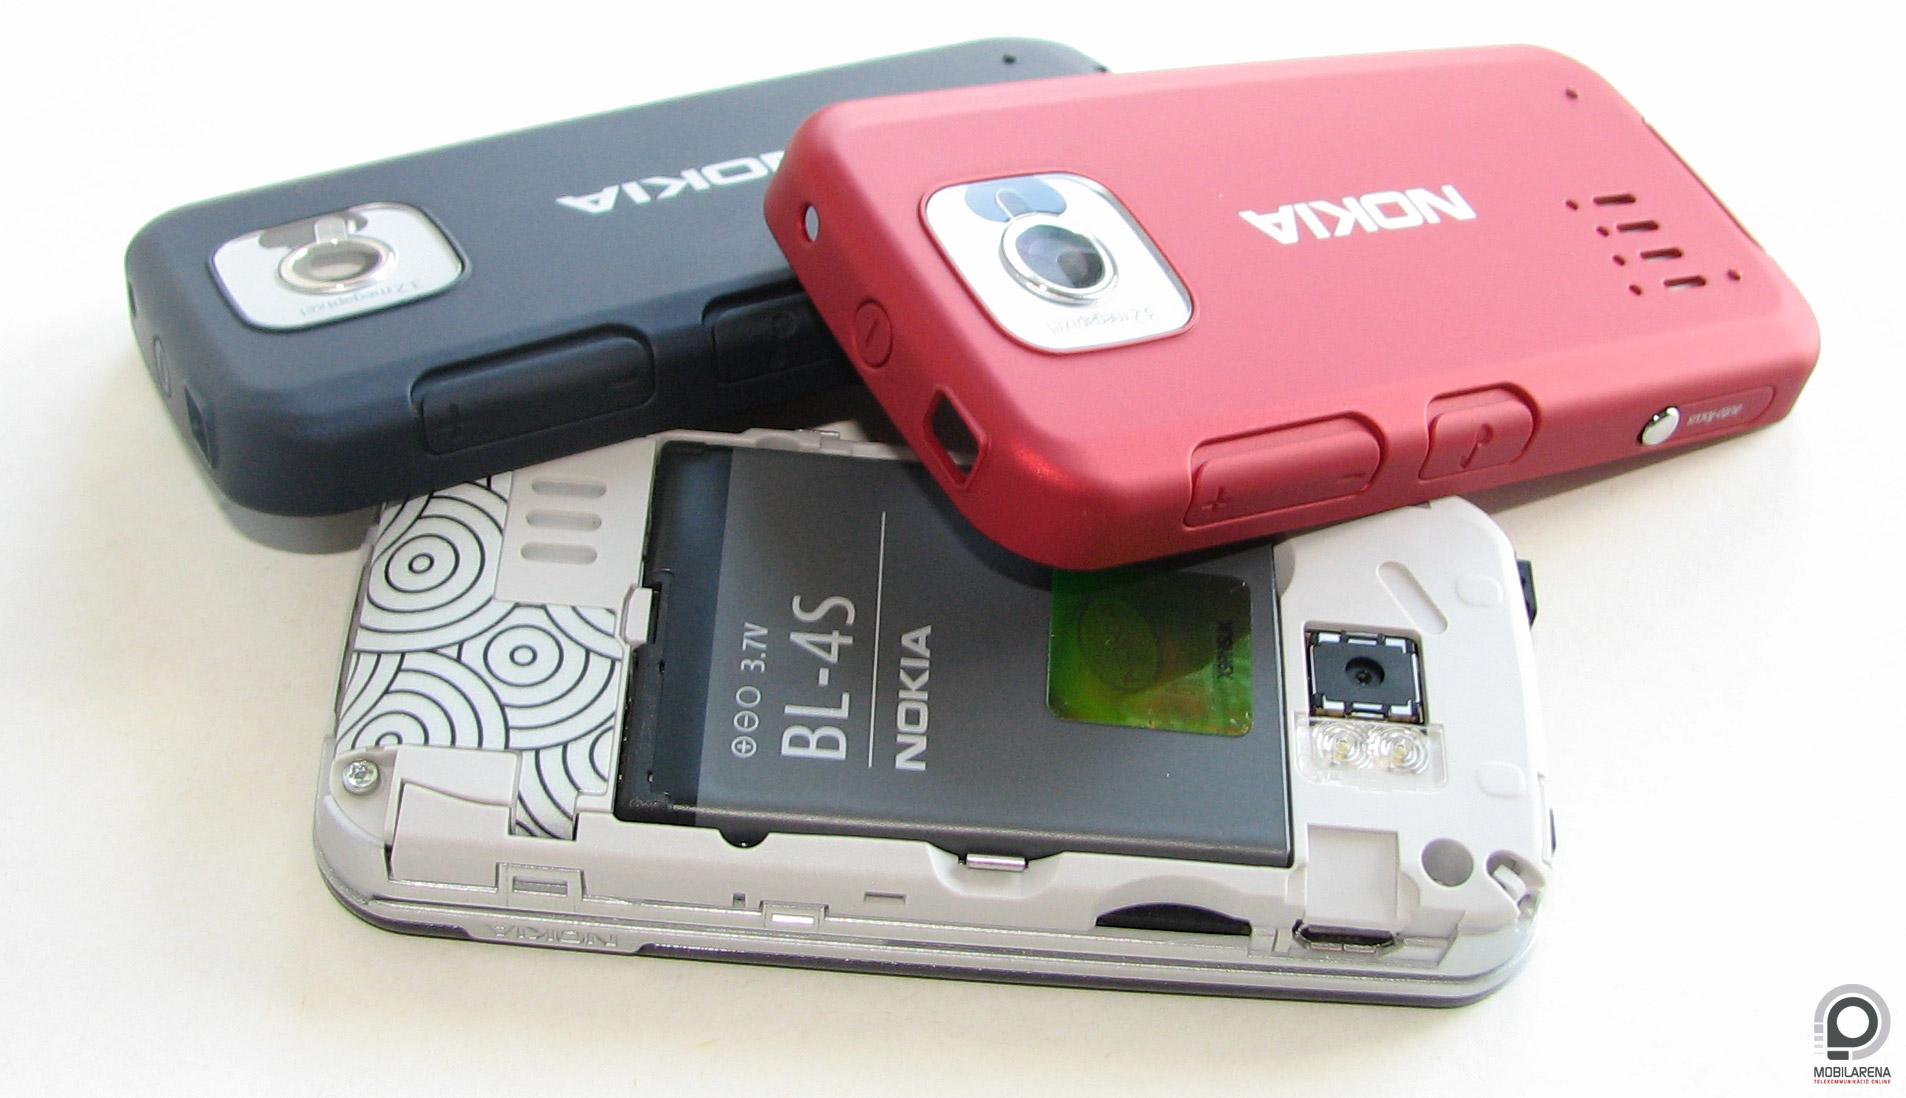 Nokia 7610 Supernova - color orgy - Mobilarena MobileArsenal teszt